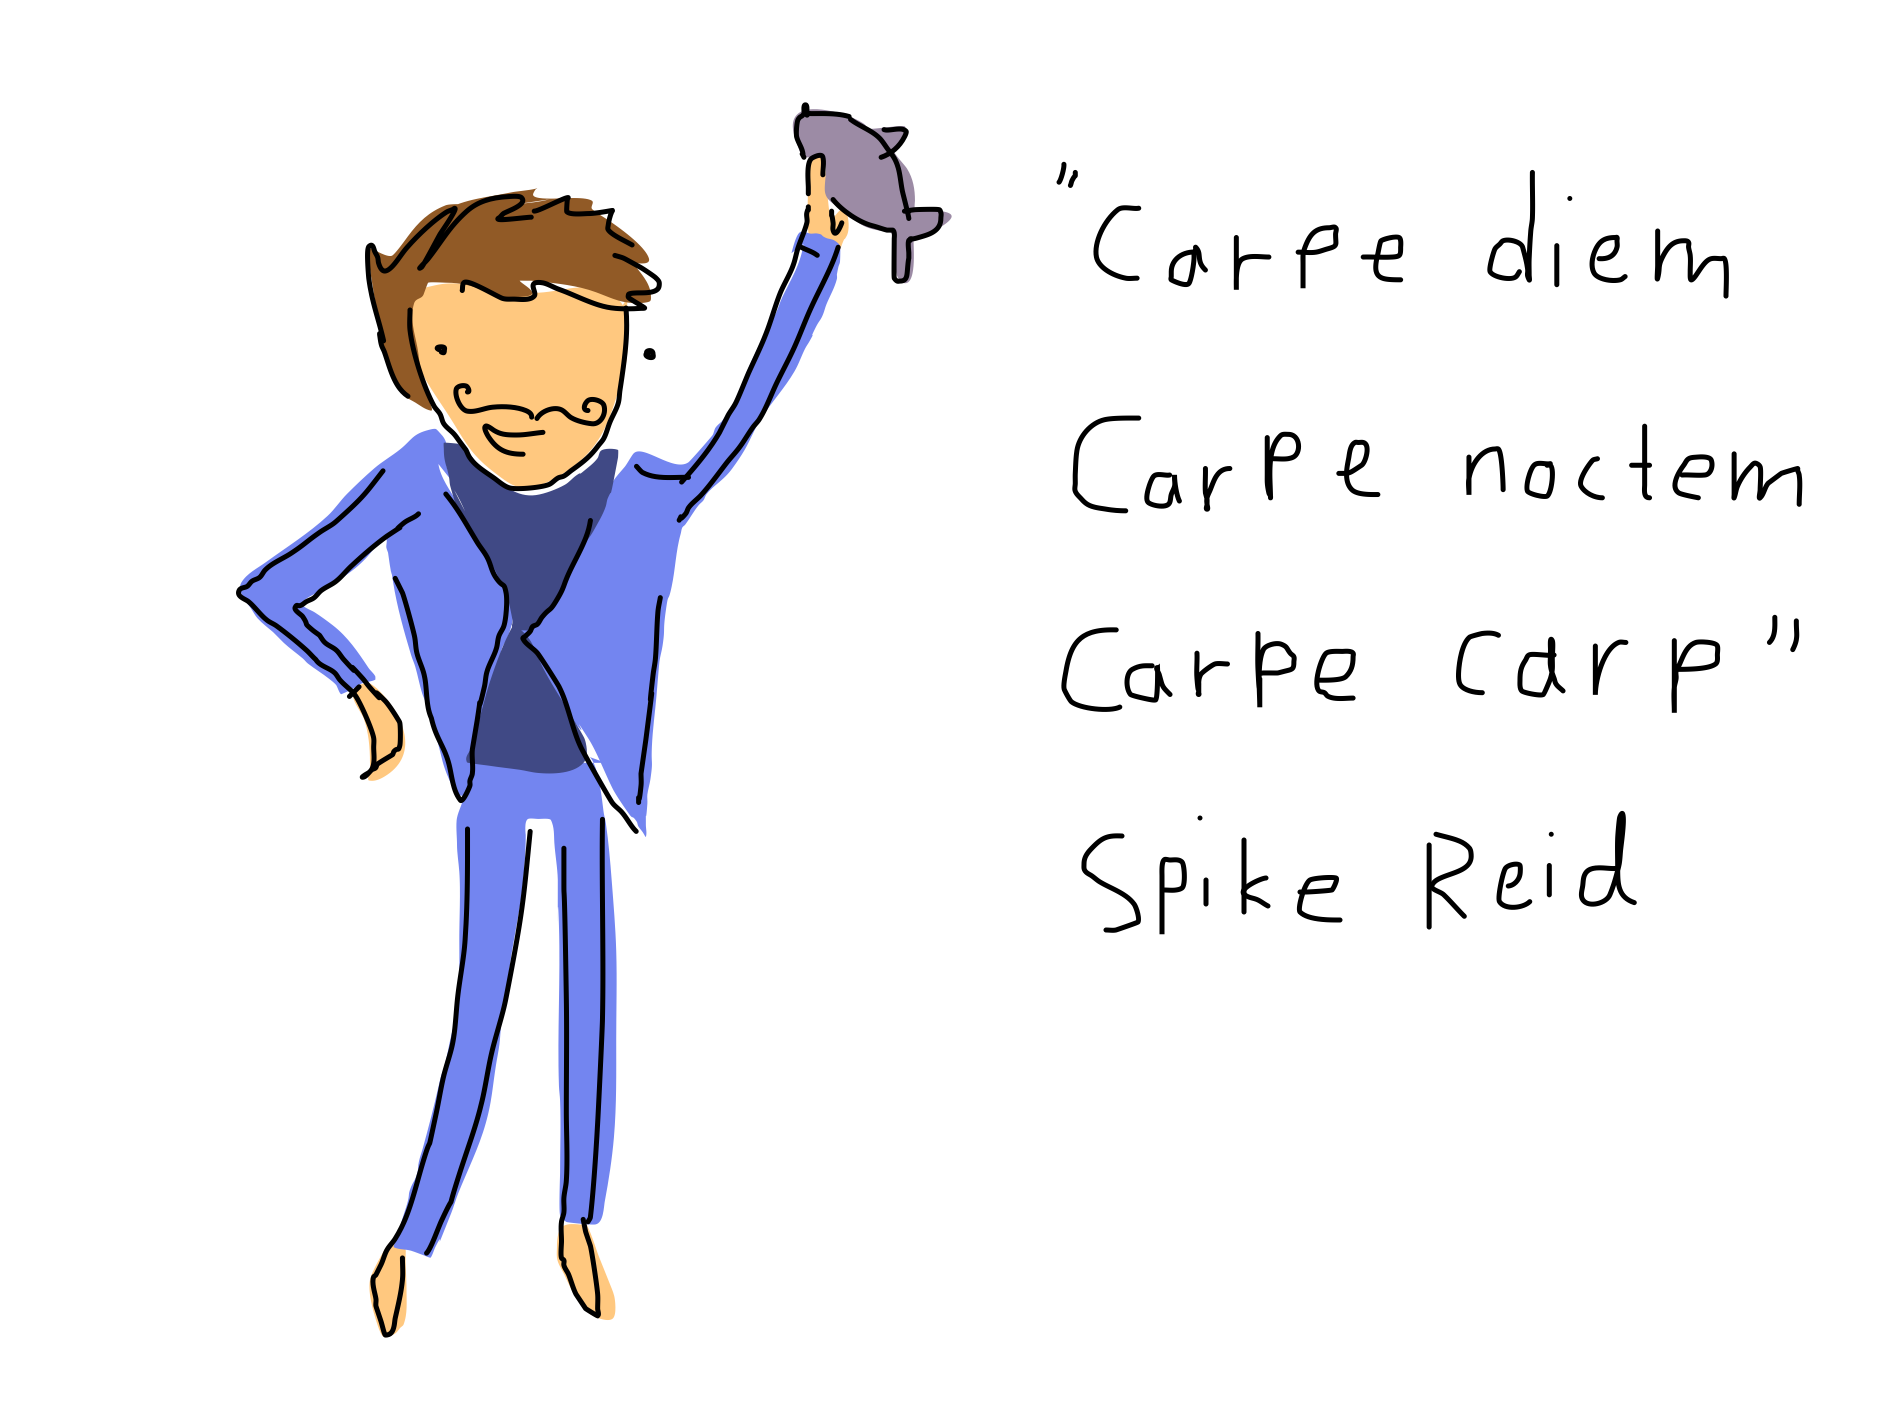 Spike Reid.png